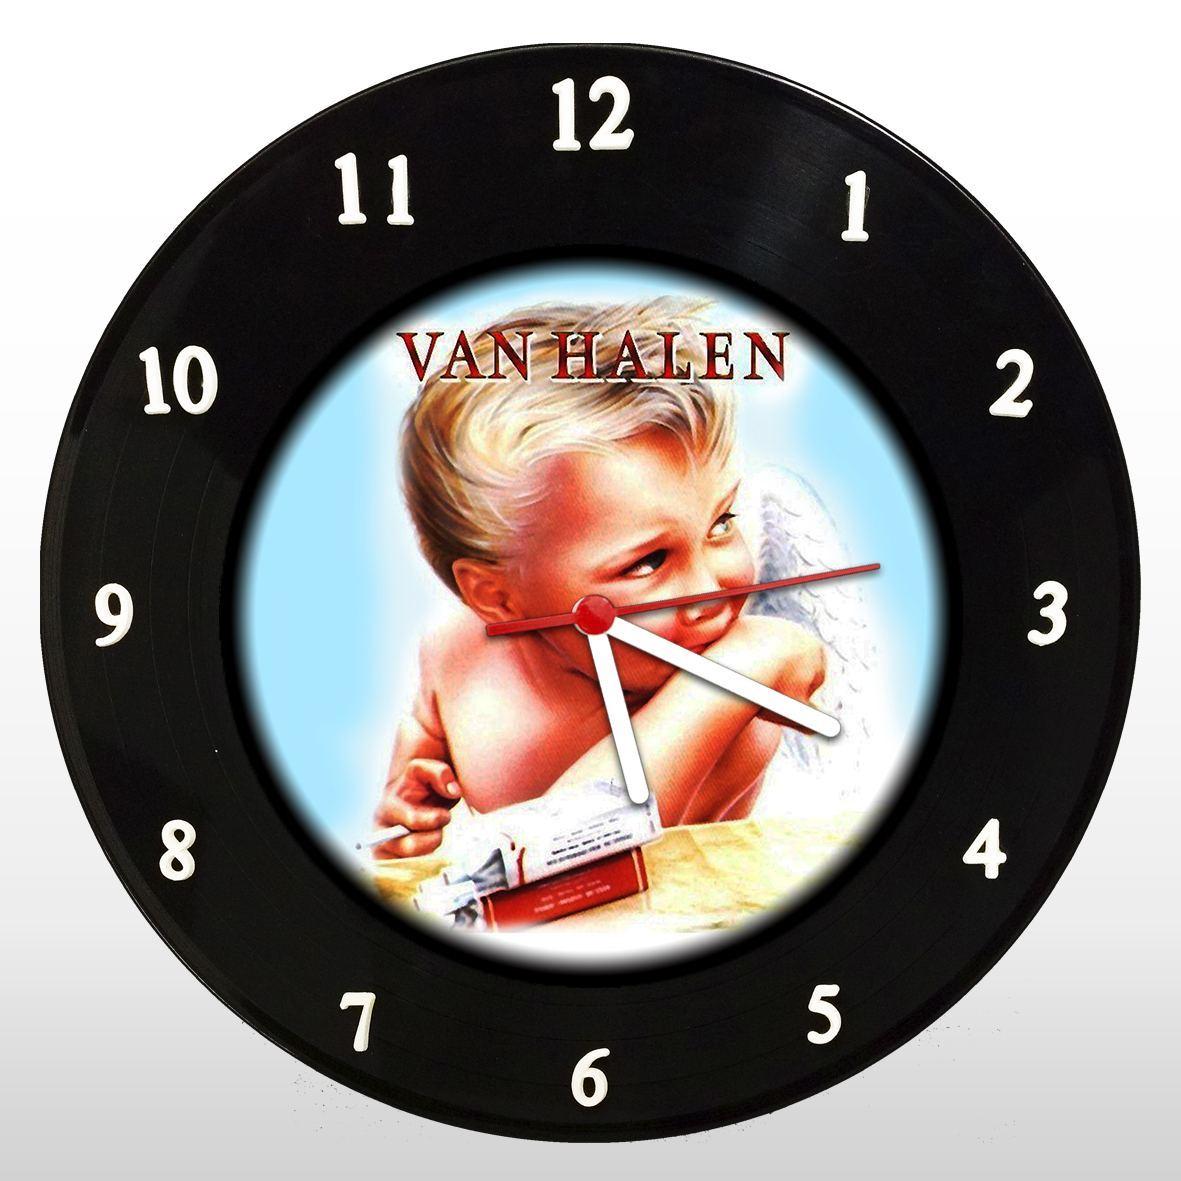 Van Halen - Relógio de Parede em Disco de Vinil - Mr. Rock